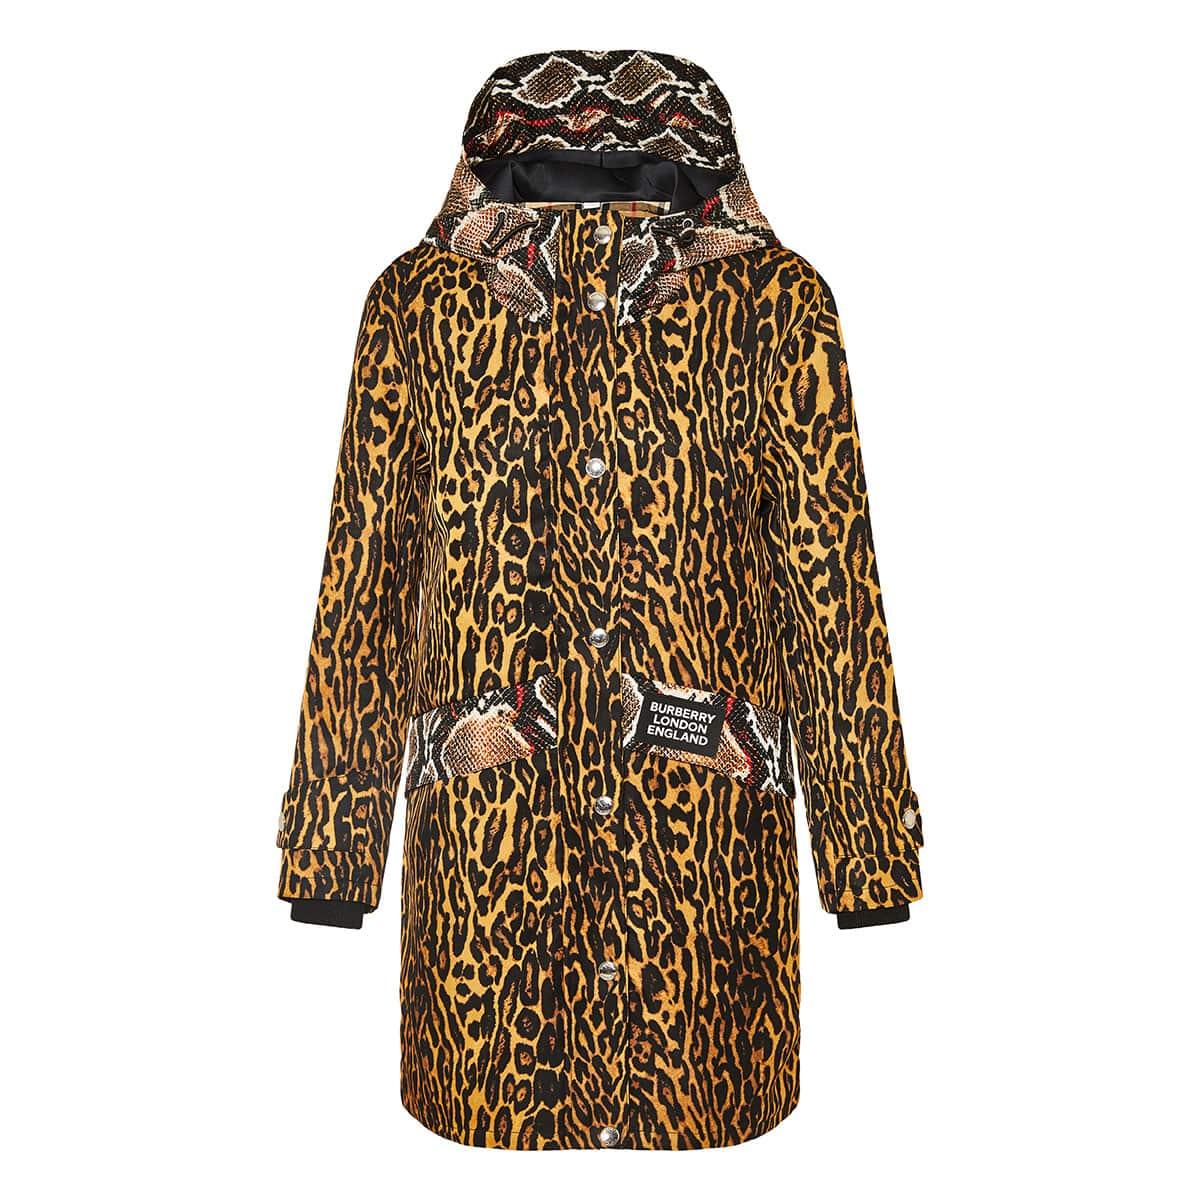 Animal printed parka jacket